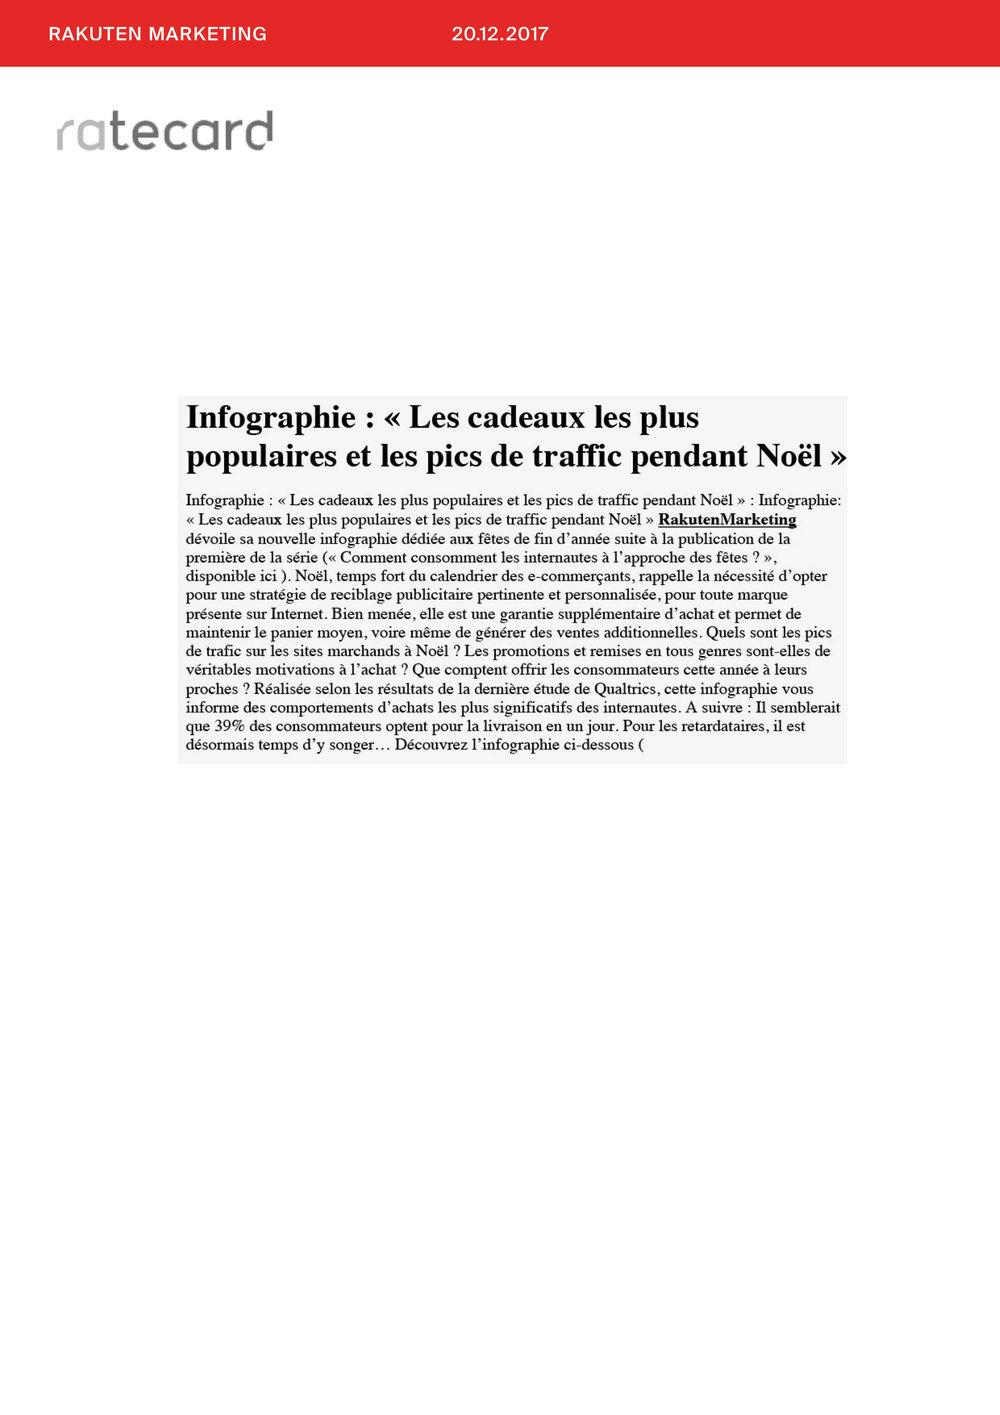 BOOKMEDIA_DEC39.jpg